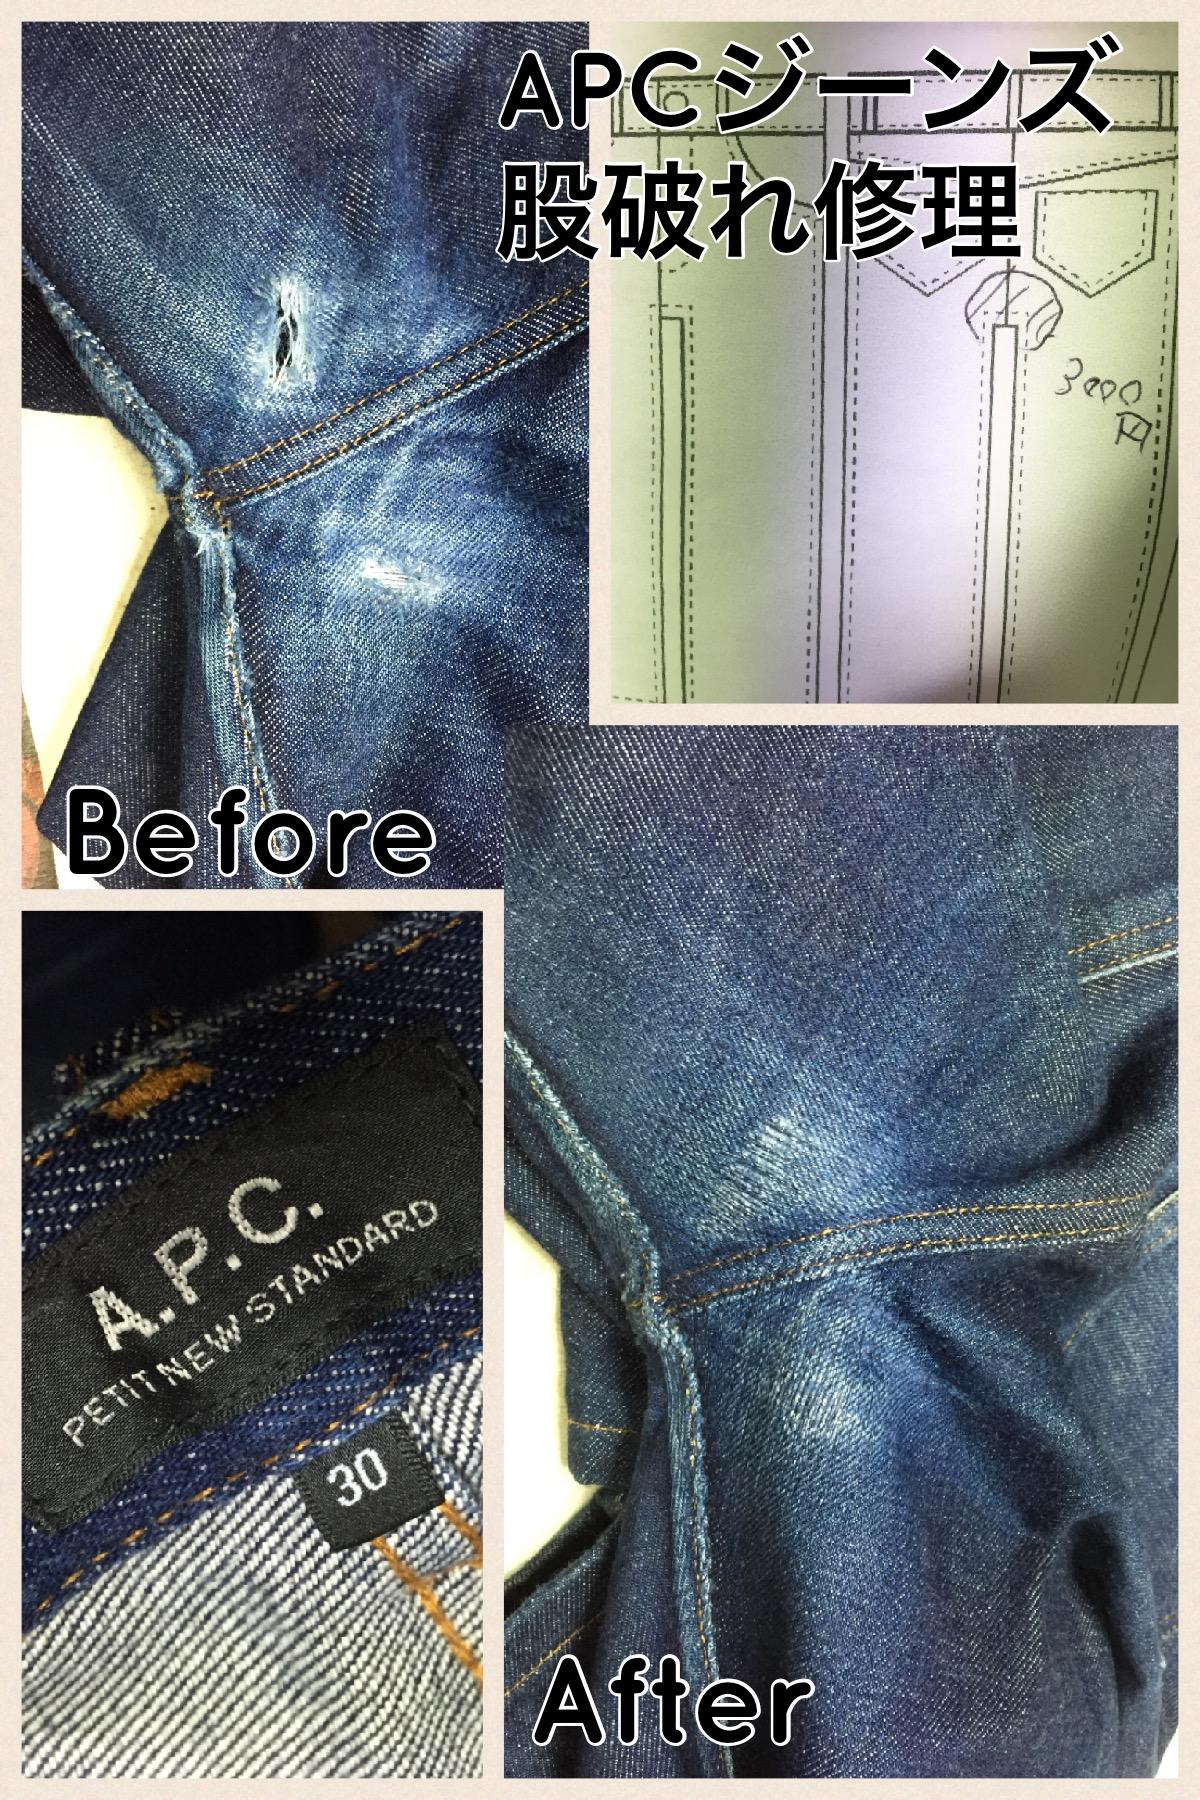 APCジーンズ股擦れ修理